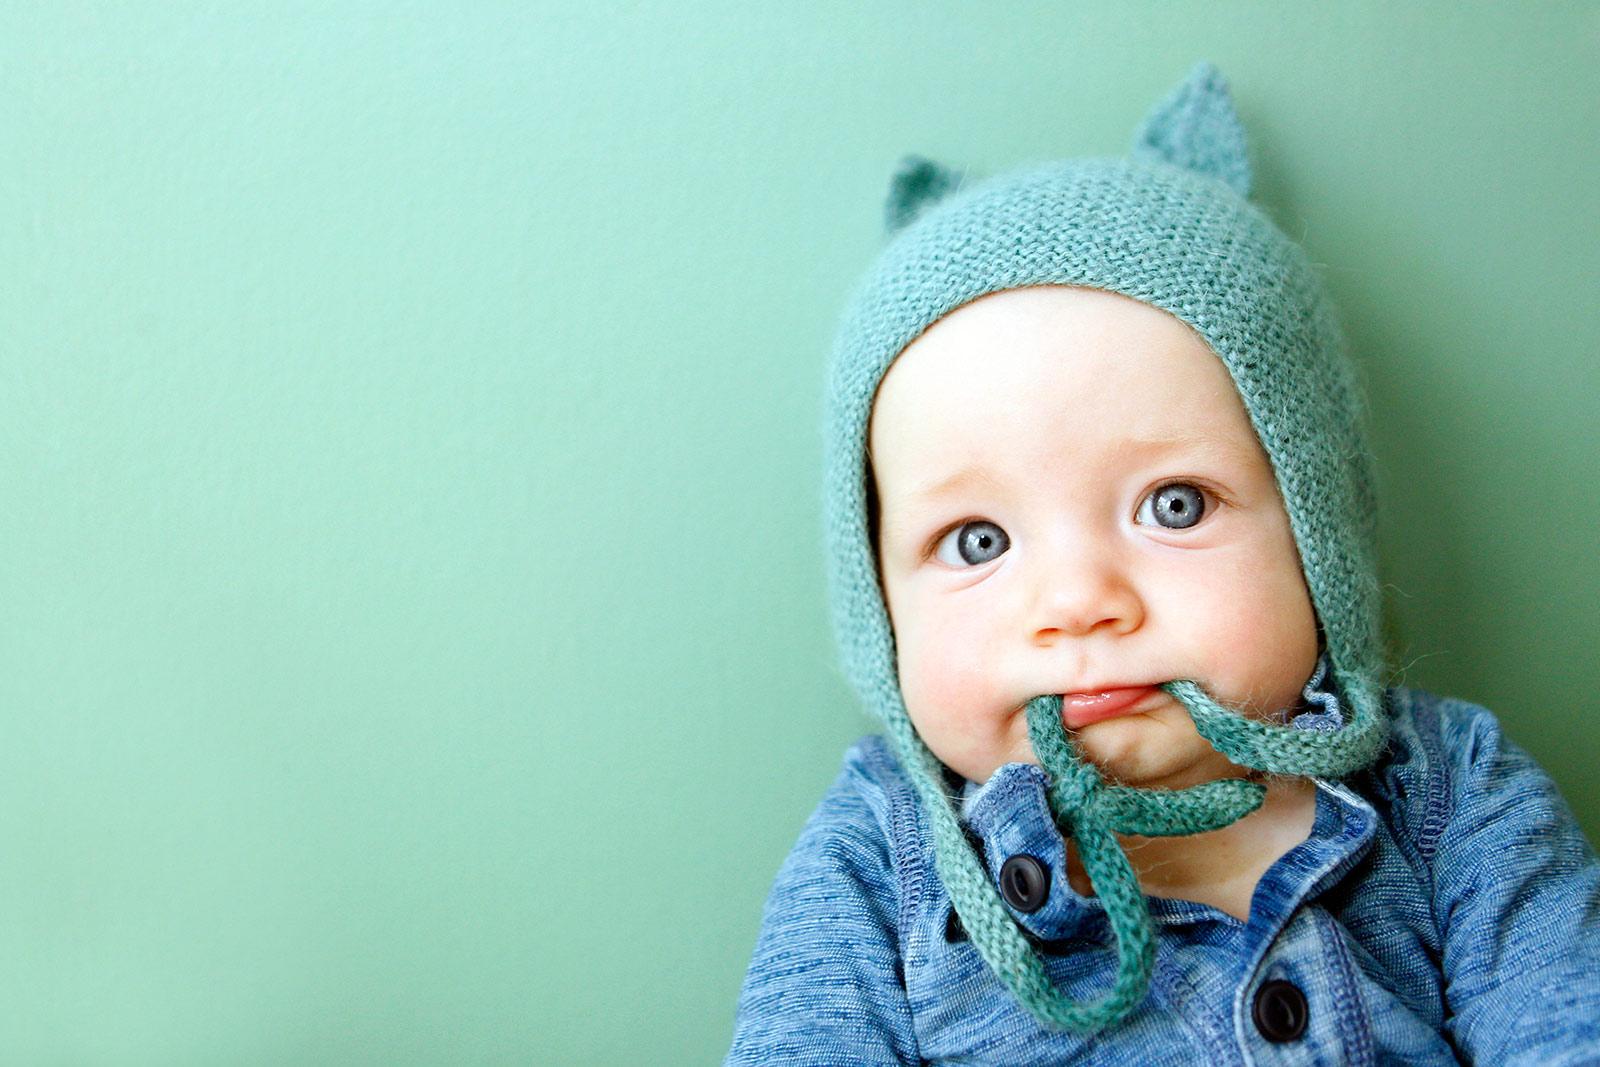 Baby-Portraits-Photography-Fox-Valley-Geneva-Alternative-Candid-Photojournalistic-Family.jpg